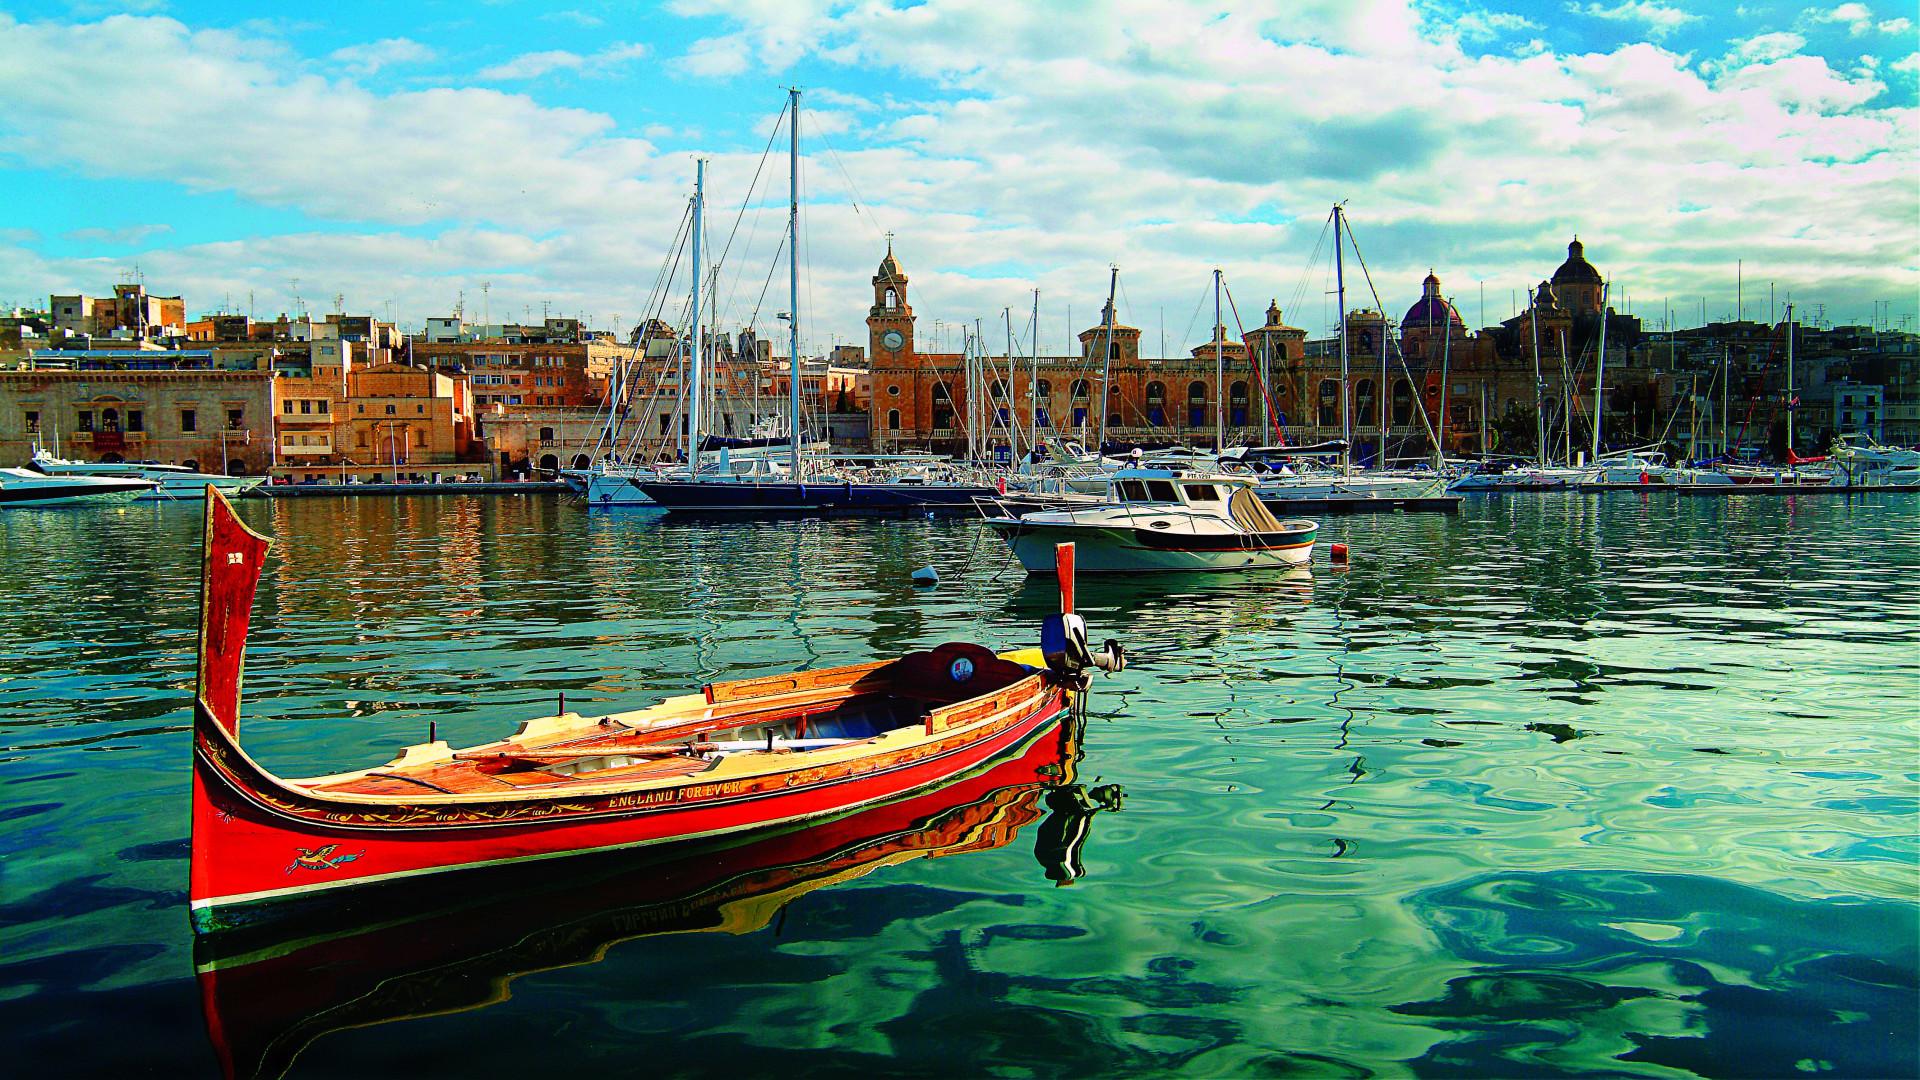 Dghajsa (rode gondel) in Vittoriosa Marina, Three Cities, Malta